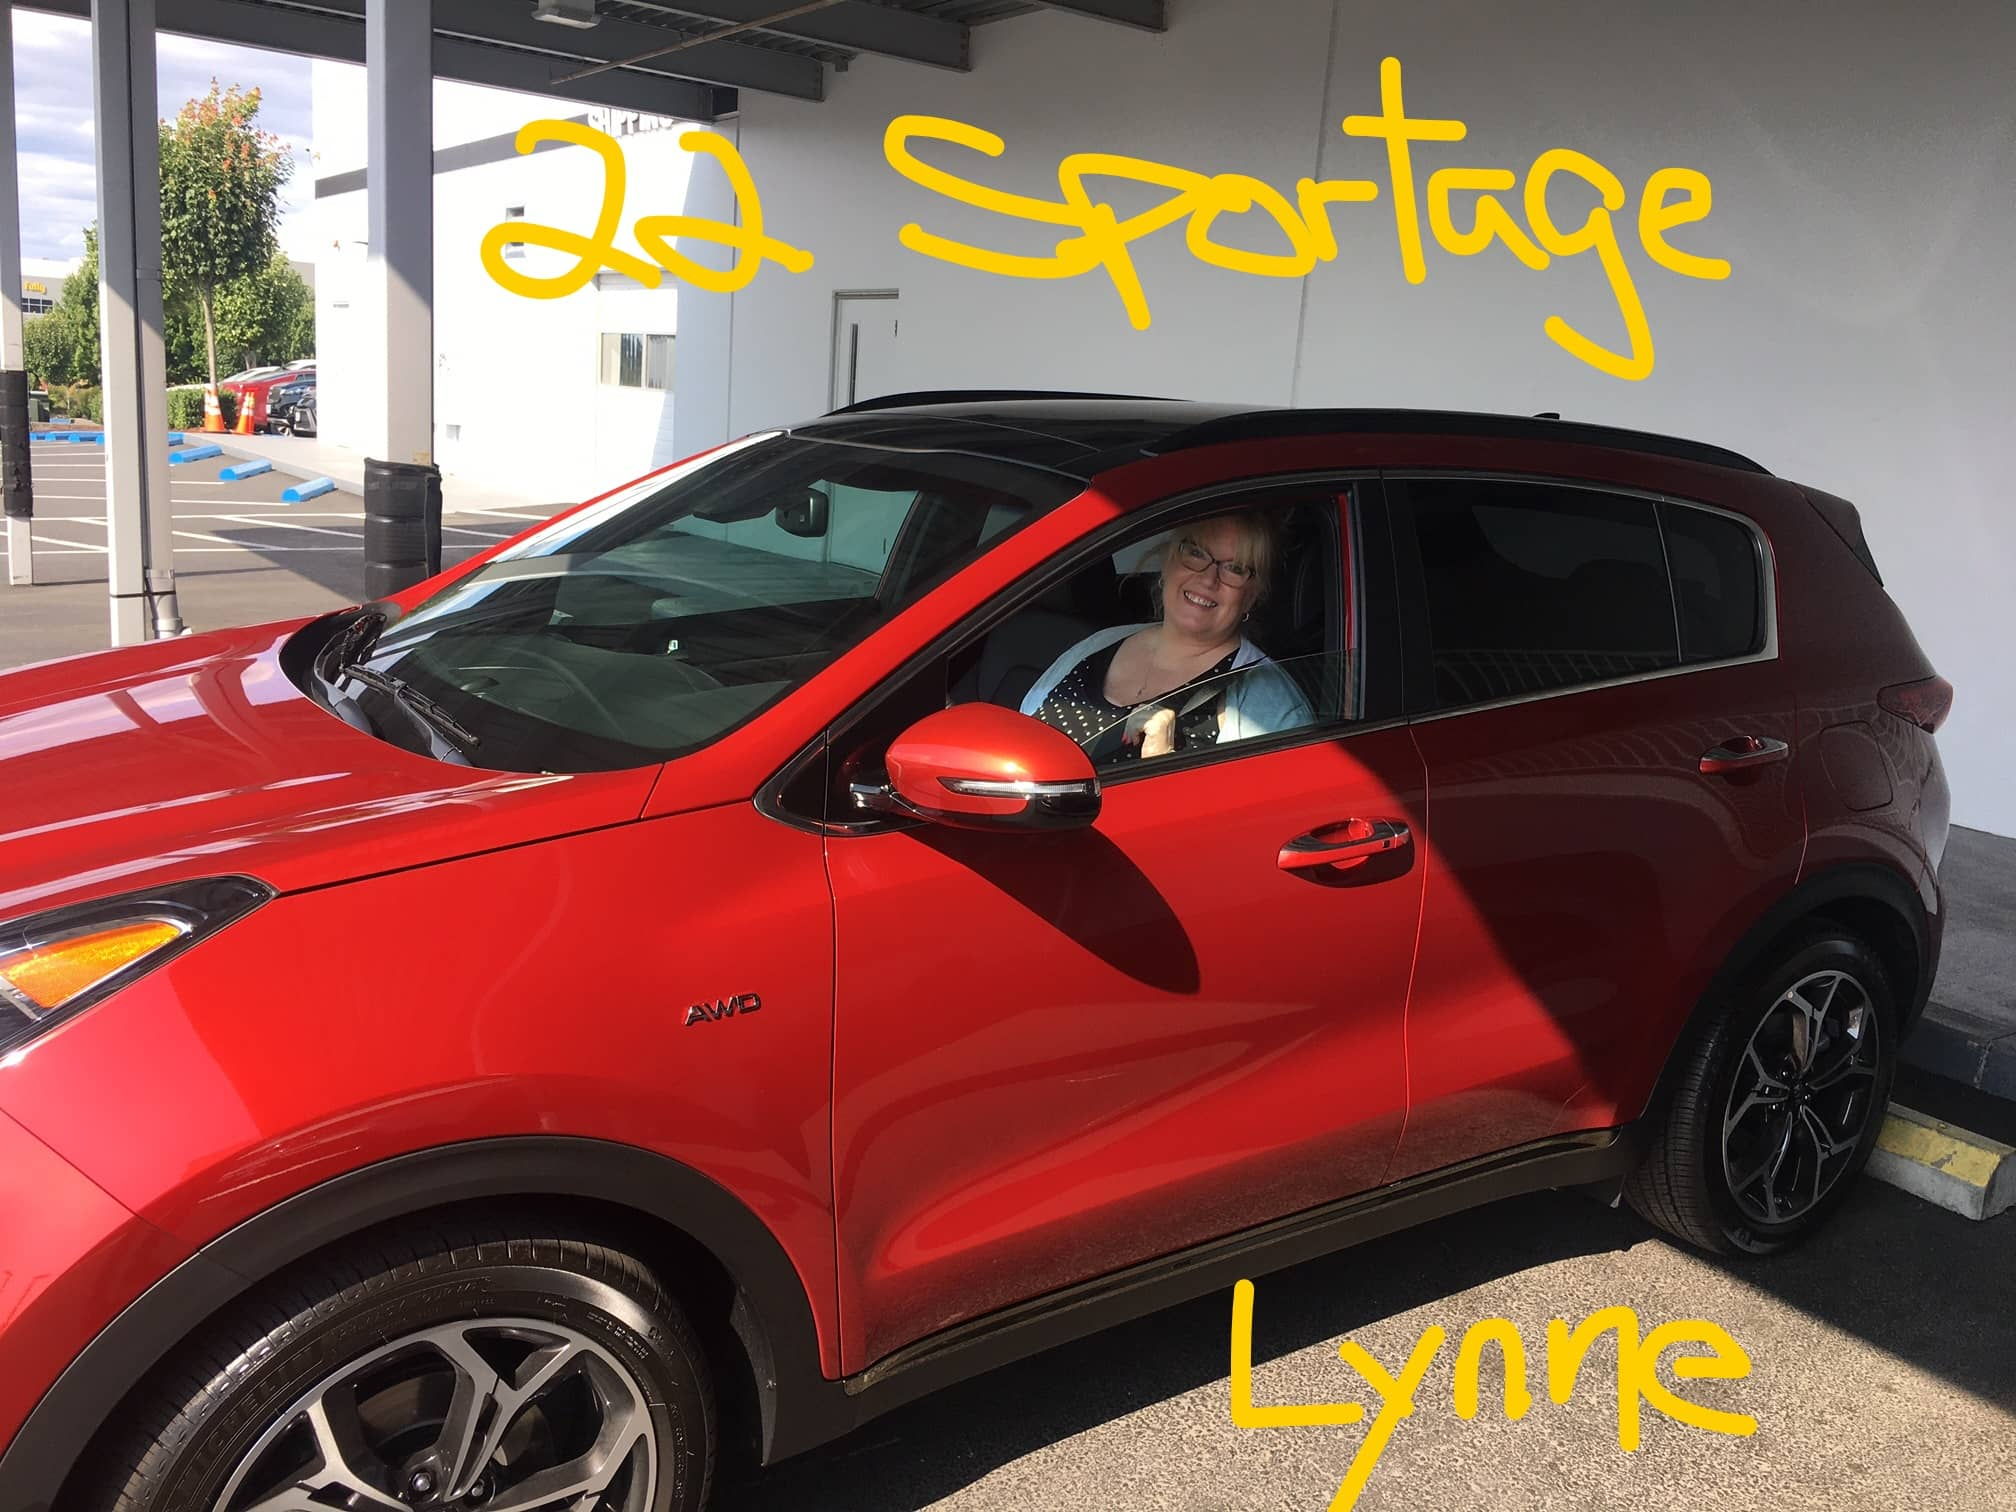 22 Sportage Lynne